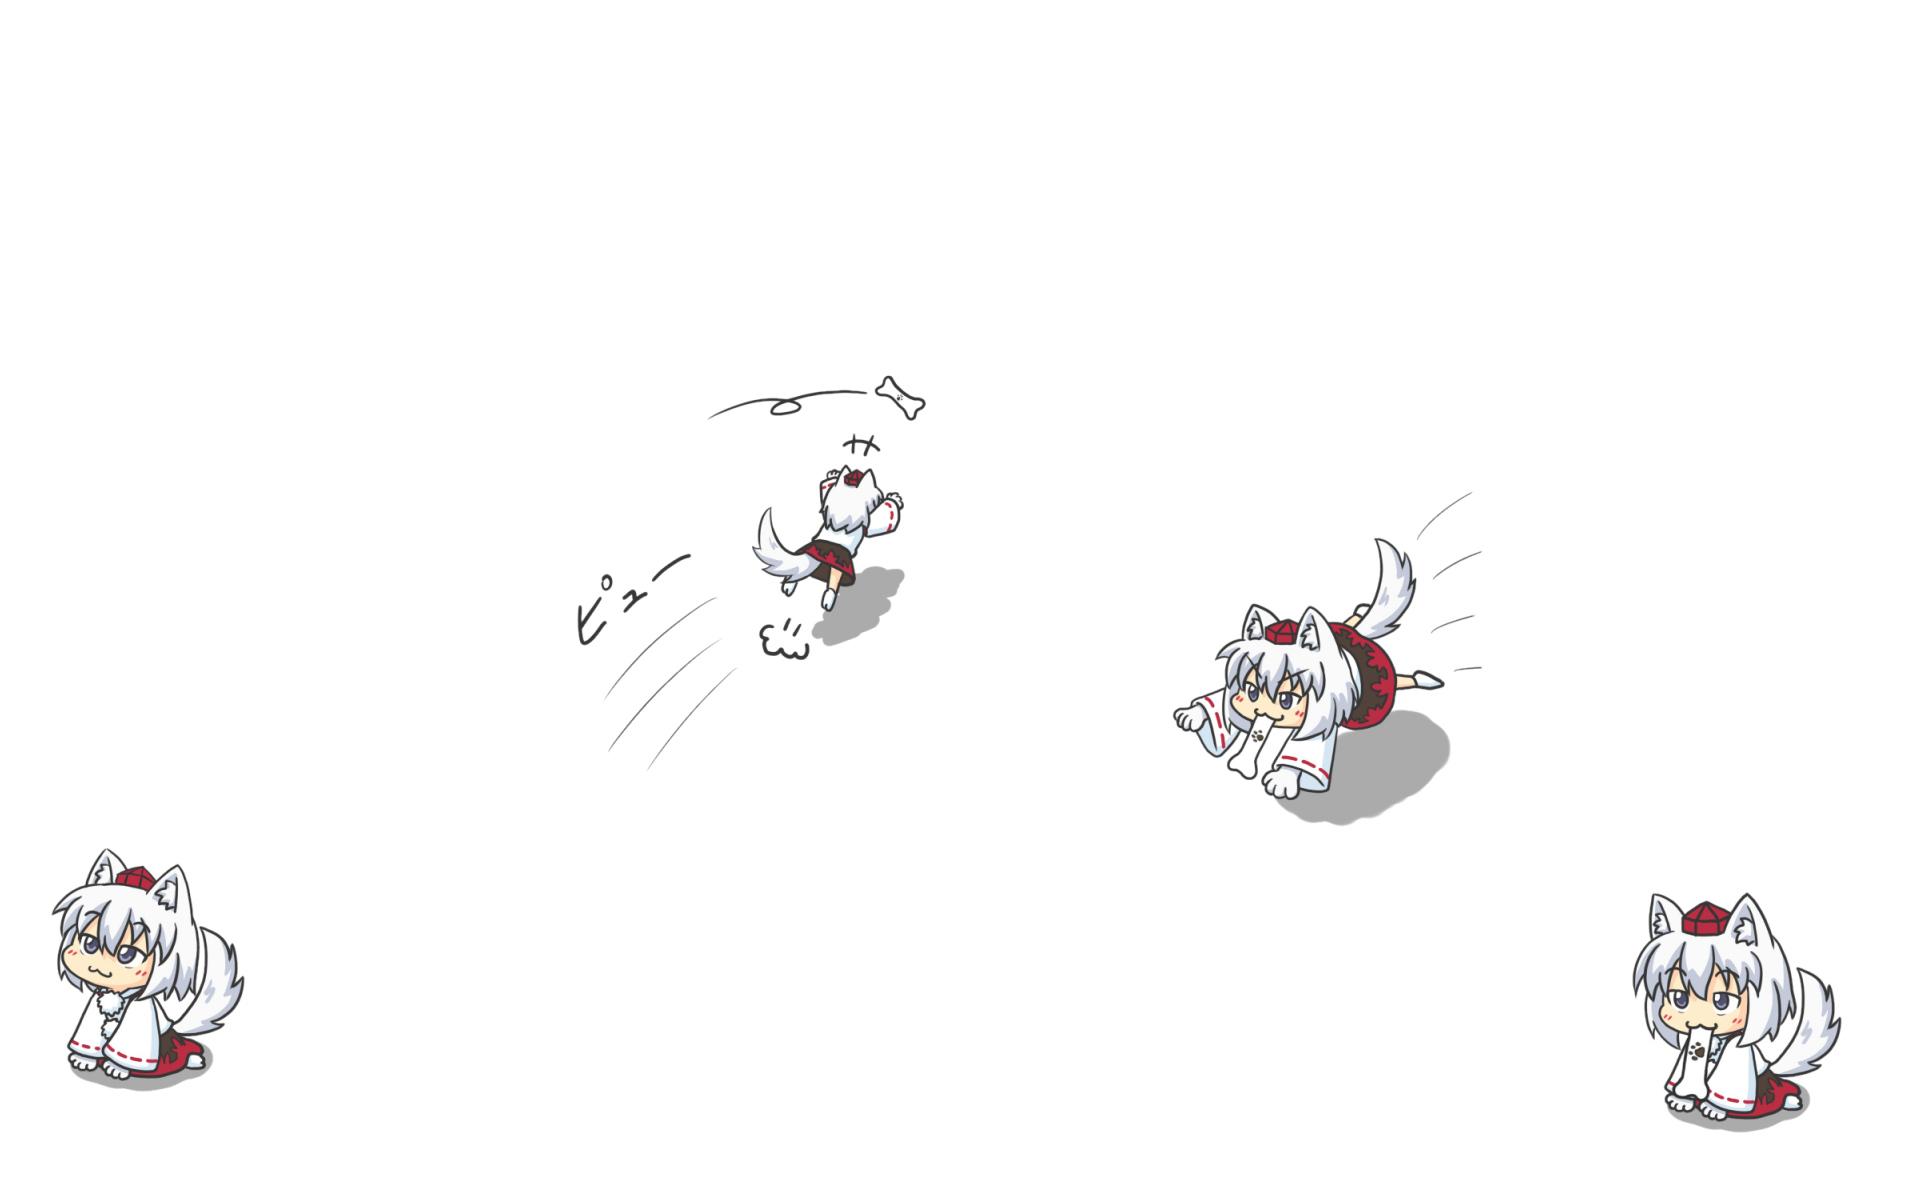 animal_ears cat_smile chibi hat inubashiri_momiji kakushiaji tail touhou white wolfgirl